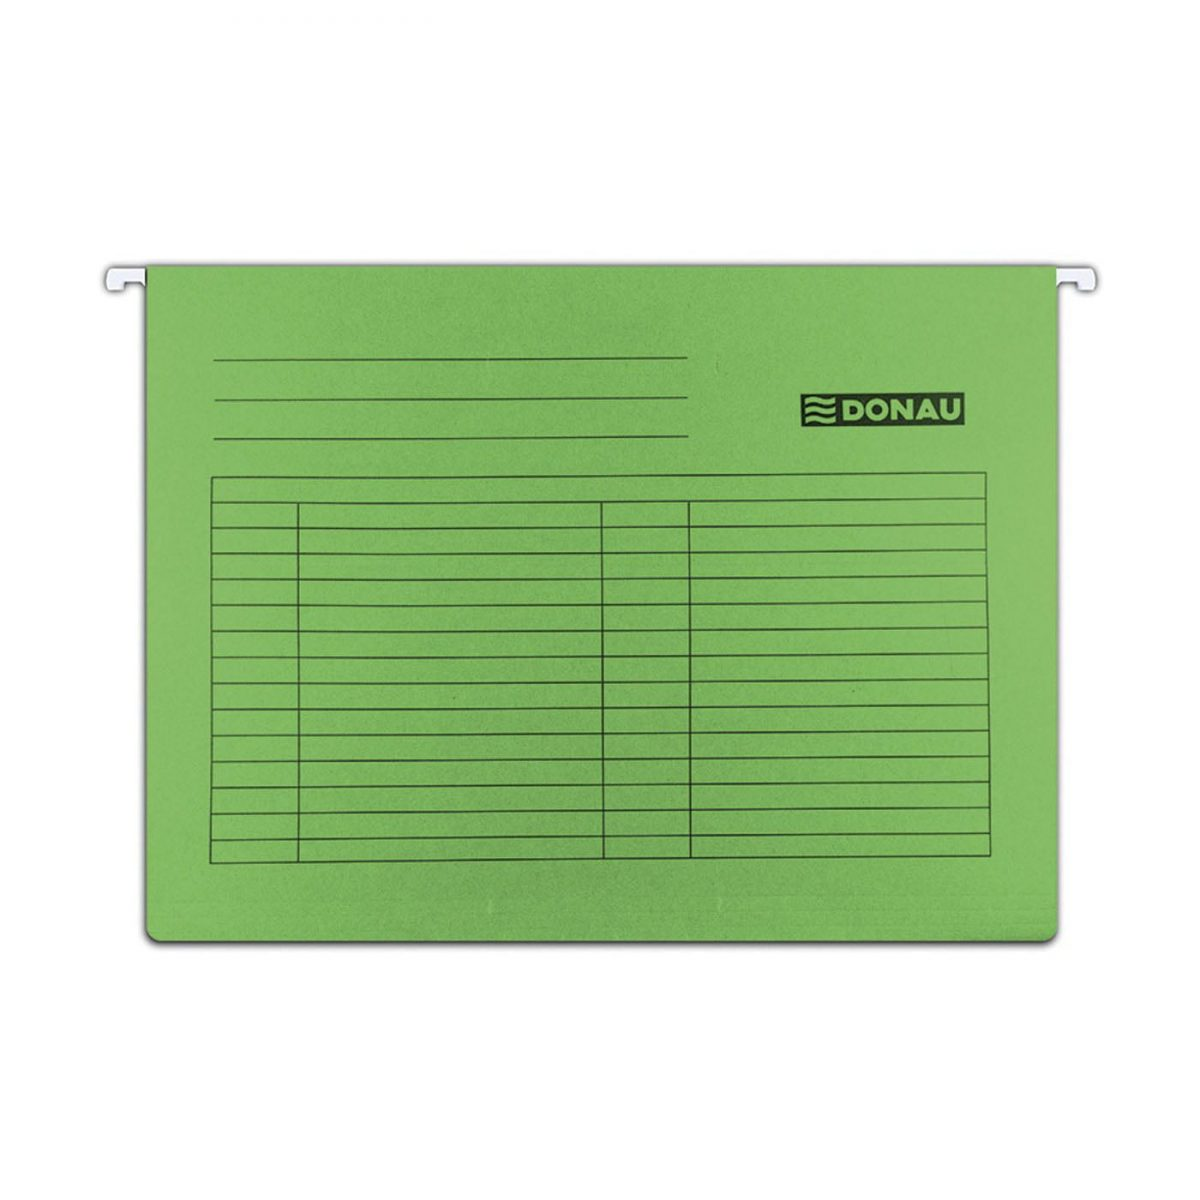 Dosar suspendabil cu eticheta, bagheta metalica, carton 230g/mp, 5 buc/set, DONAU - verde